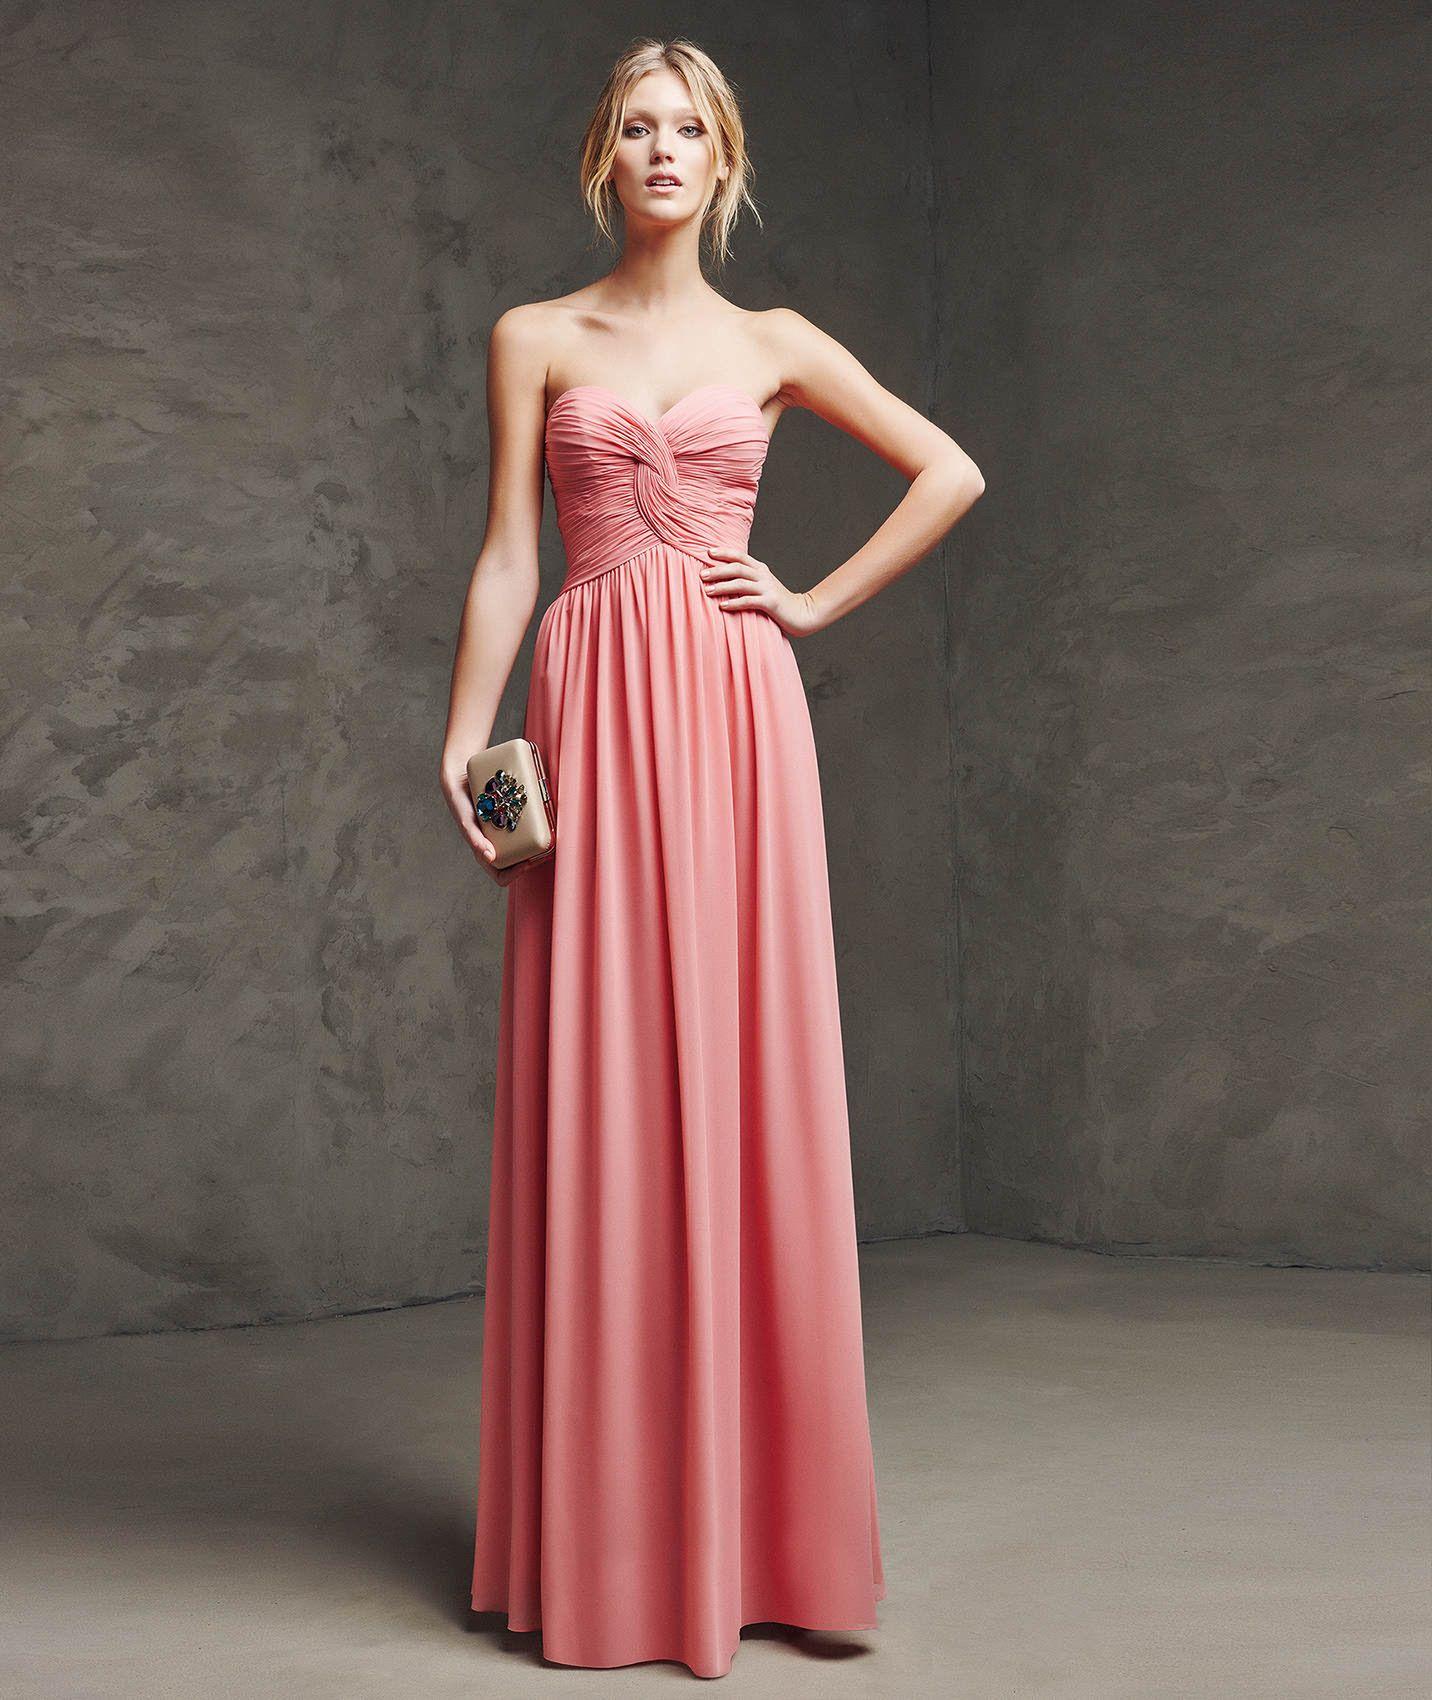 Vestido de gasa de fiesta | Dresses | Pinterest | Neckline, Party ...